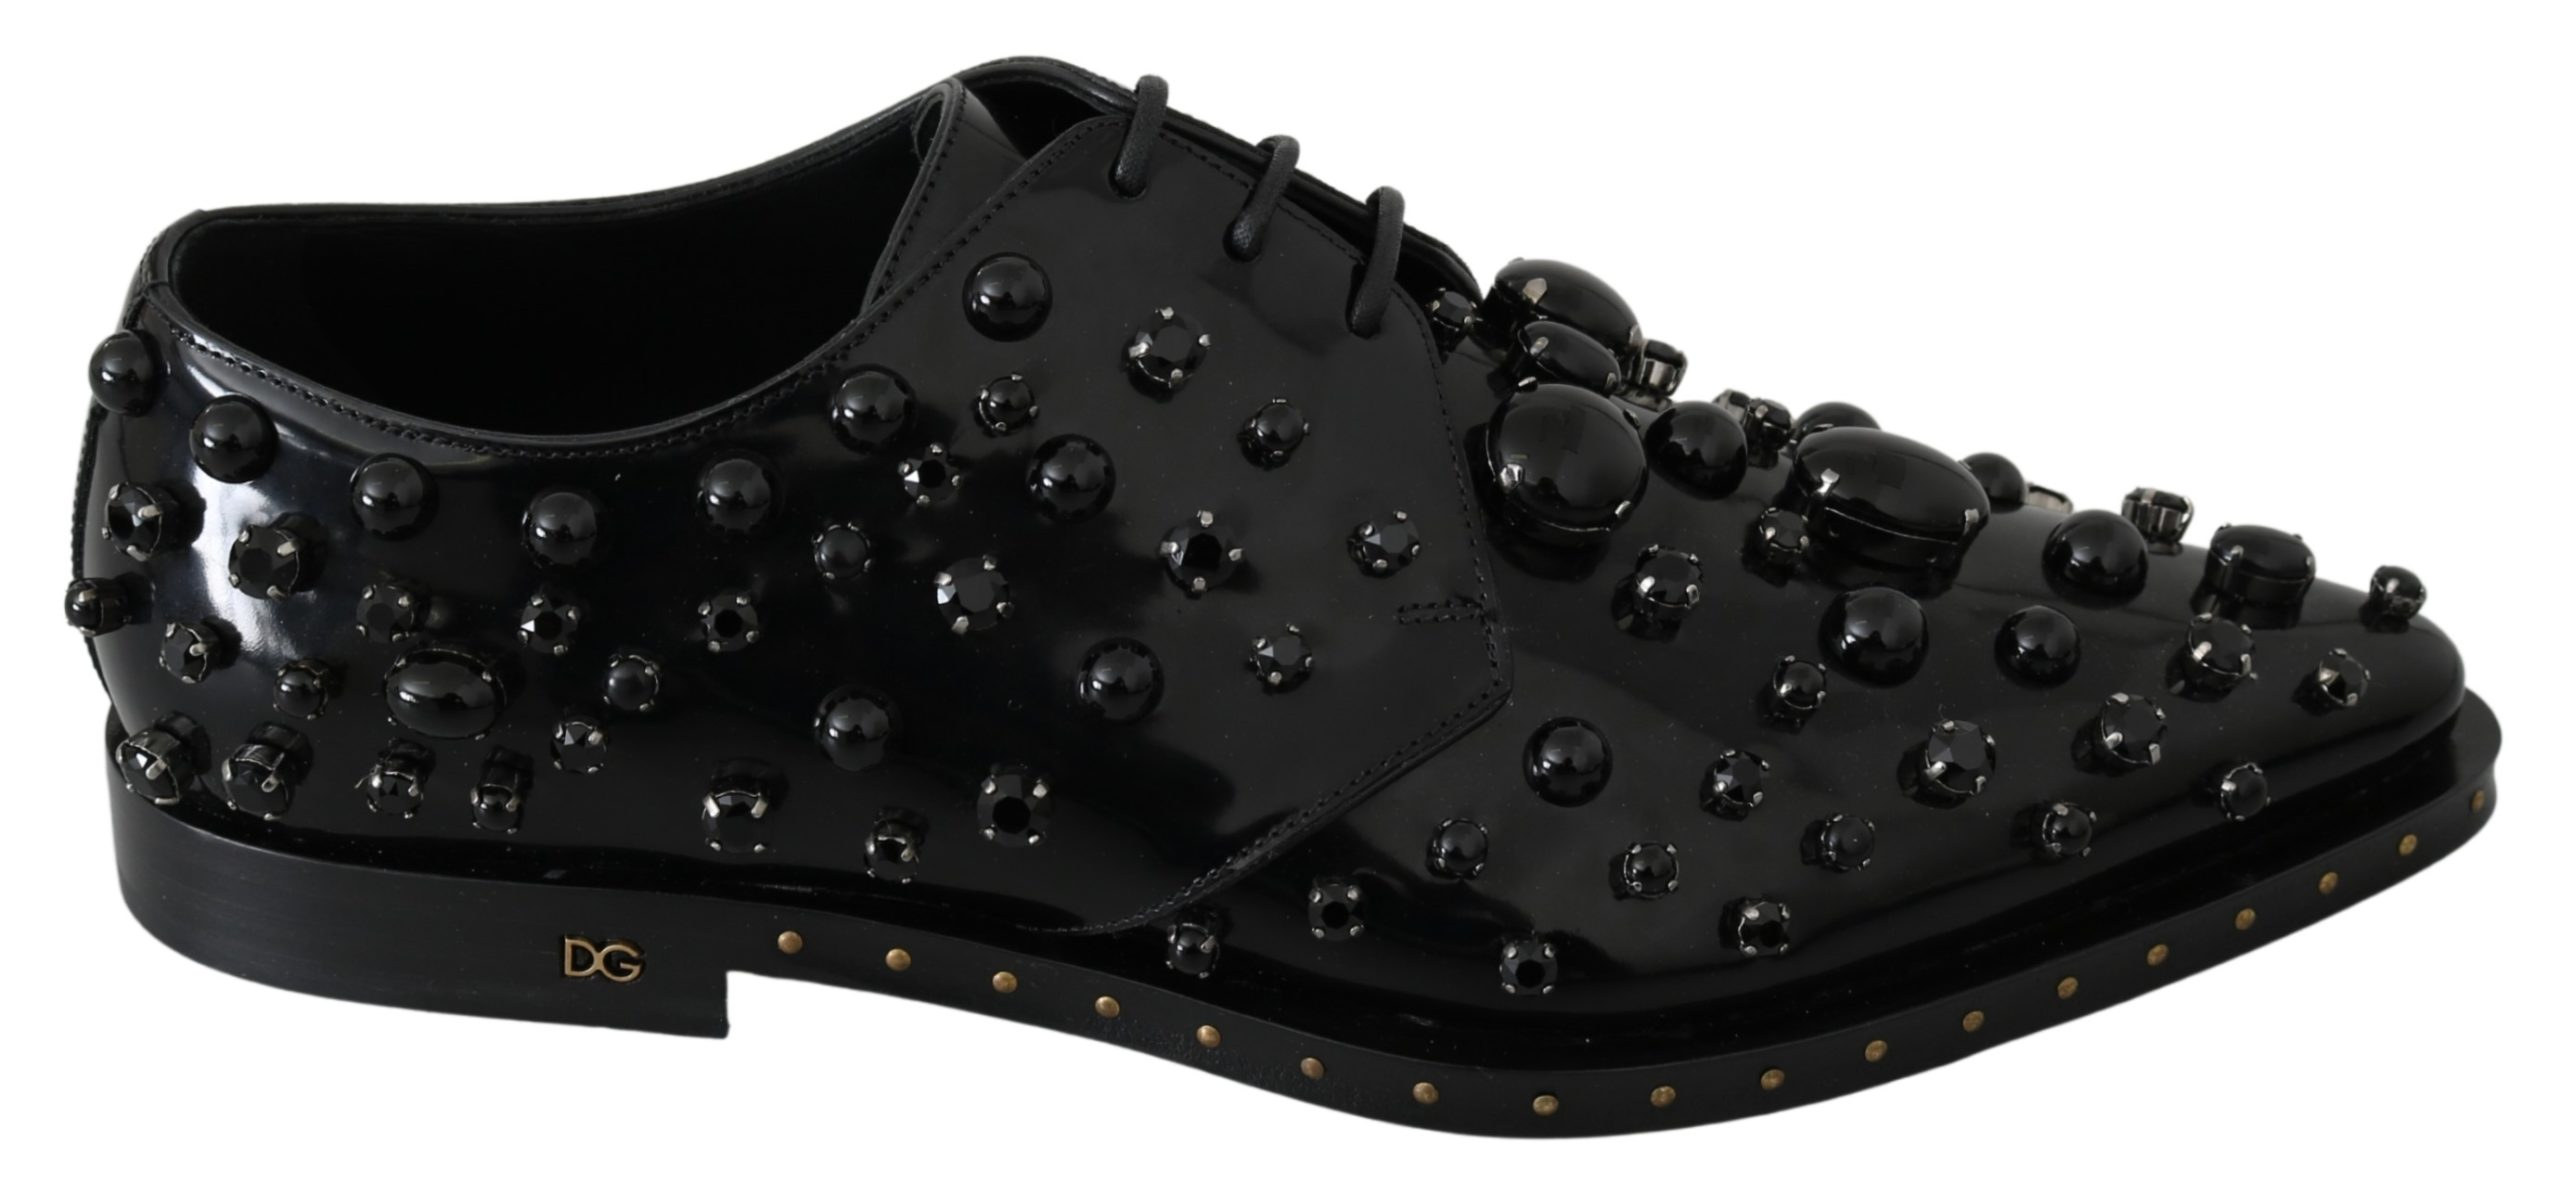 Dolce & Gabbana Women's Crystals Dress Broque Shoe Black LA7209 - EU40/US9.5